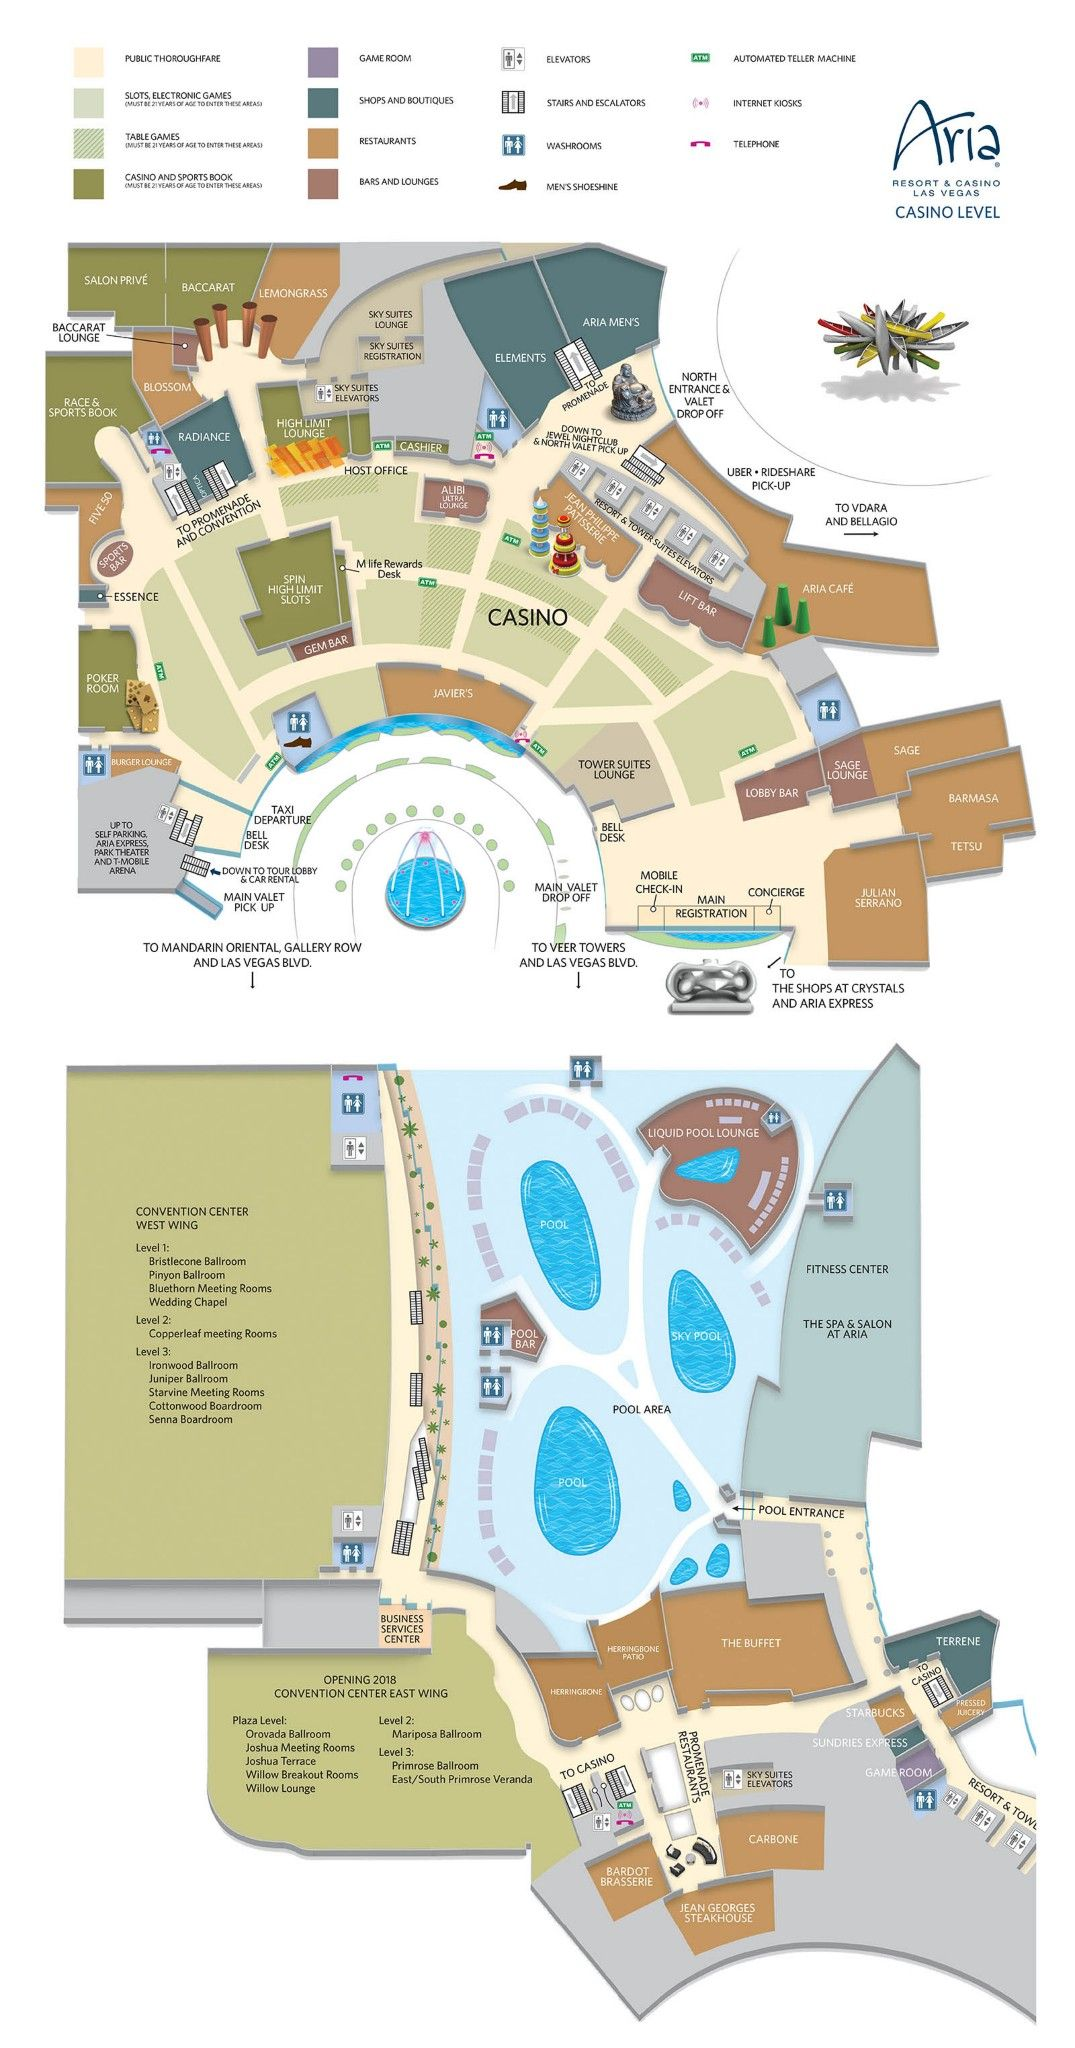 Pin By Dony Mcclatchey On Vegas Baby In 2020 Las Vegas Map Las Vegas Hotels Vegas Trip